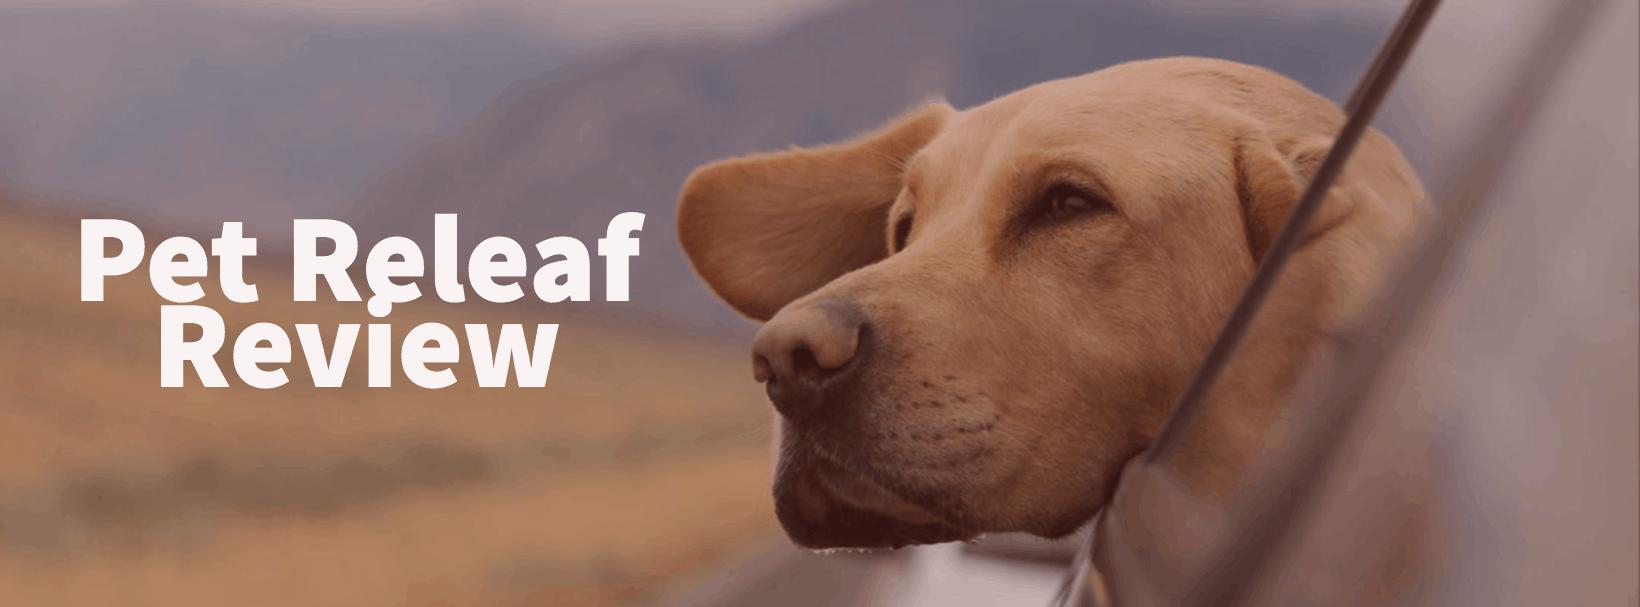 Pet Releaf Hemp Oil Reviews